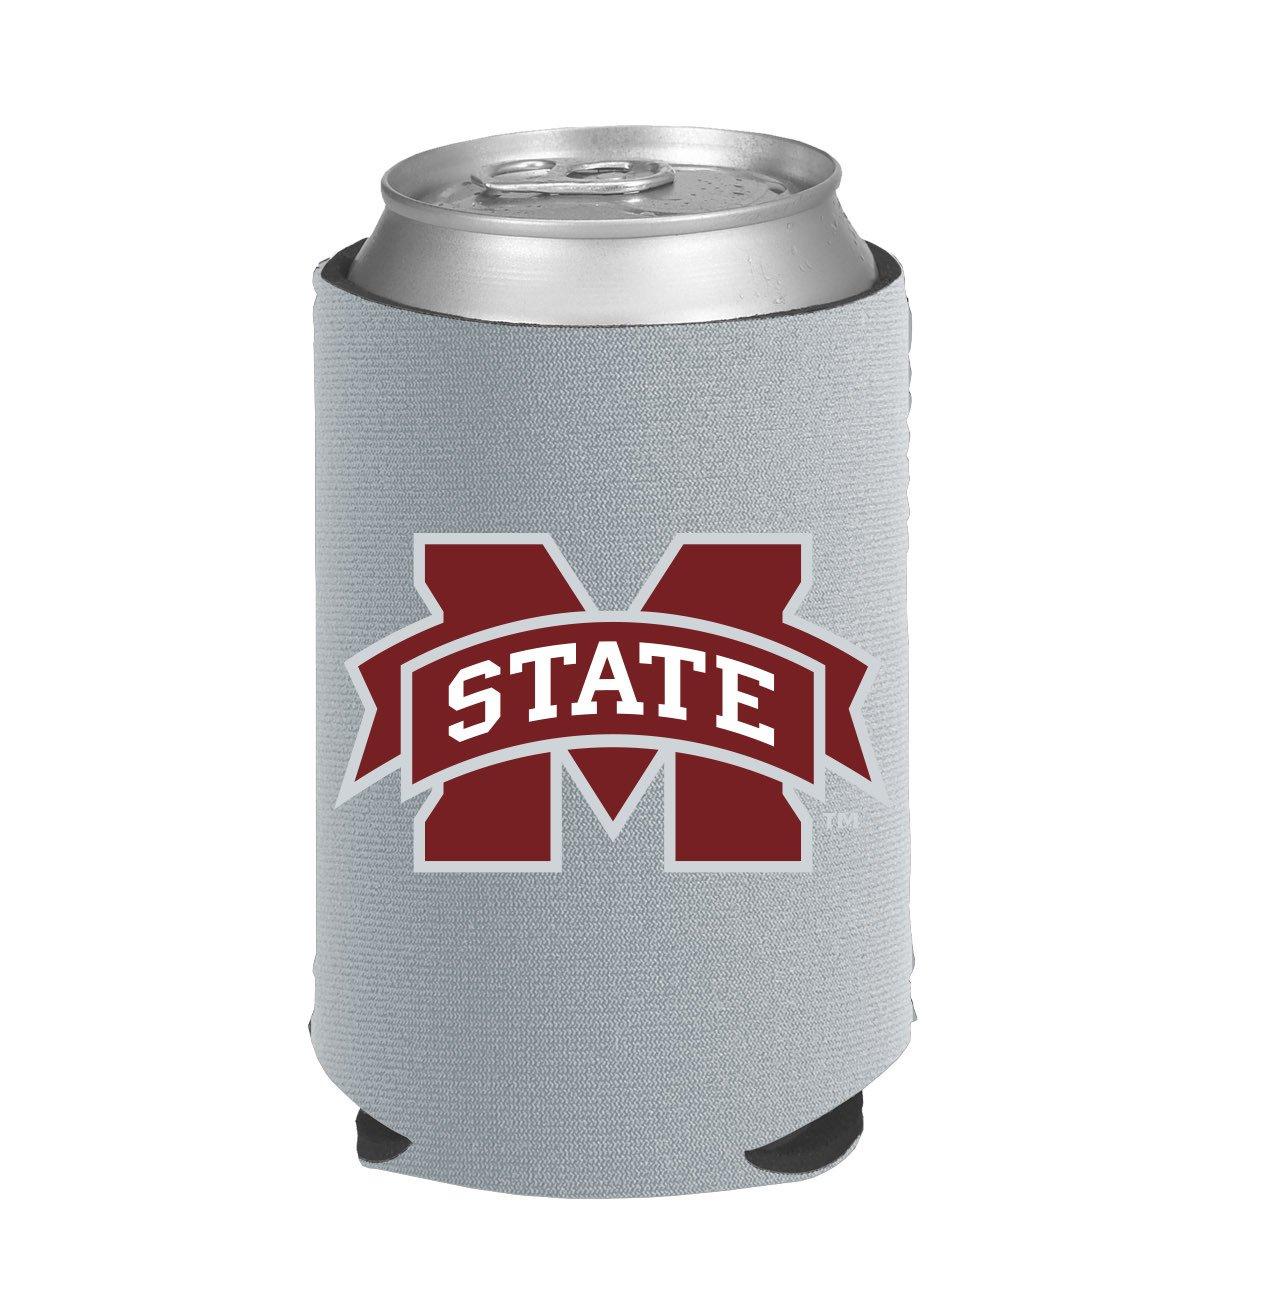 Kolder Mississippi State University Kolder Kaddy